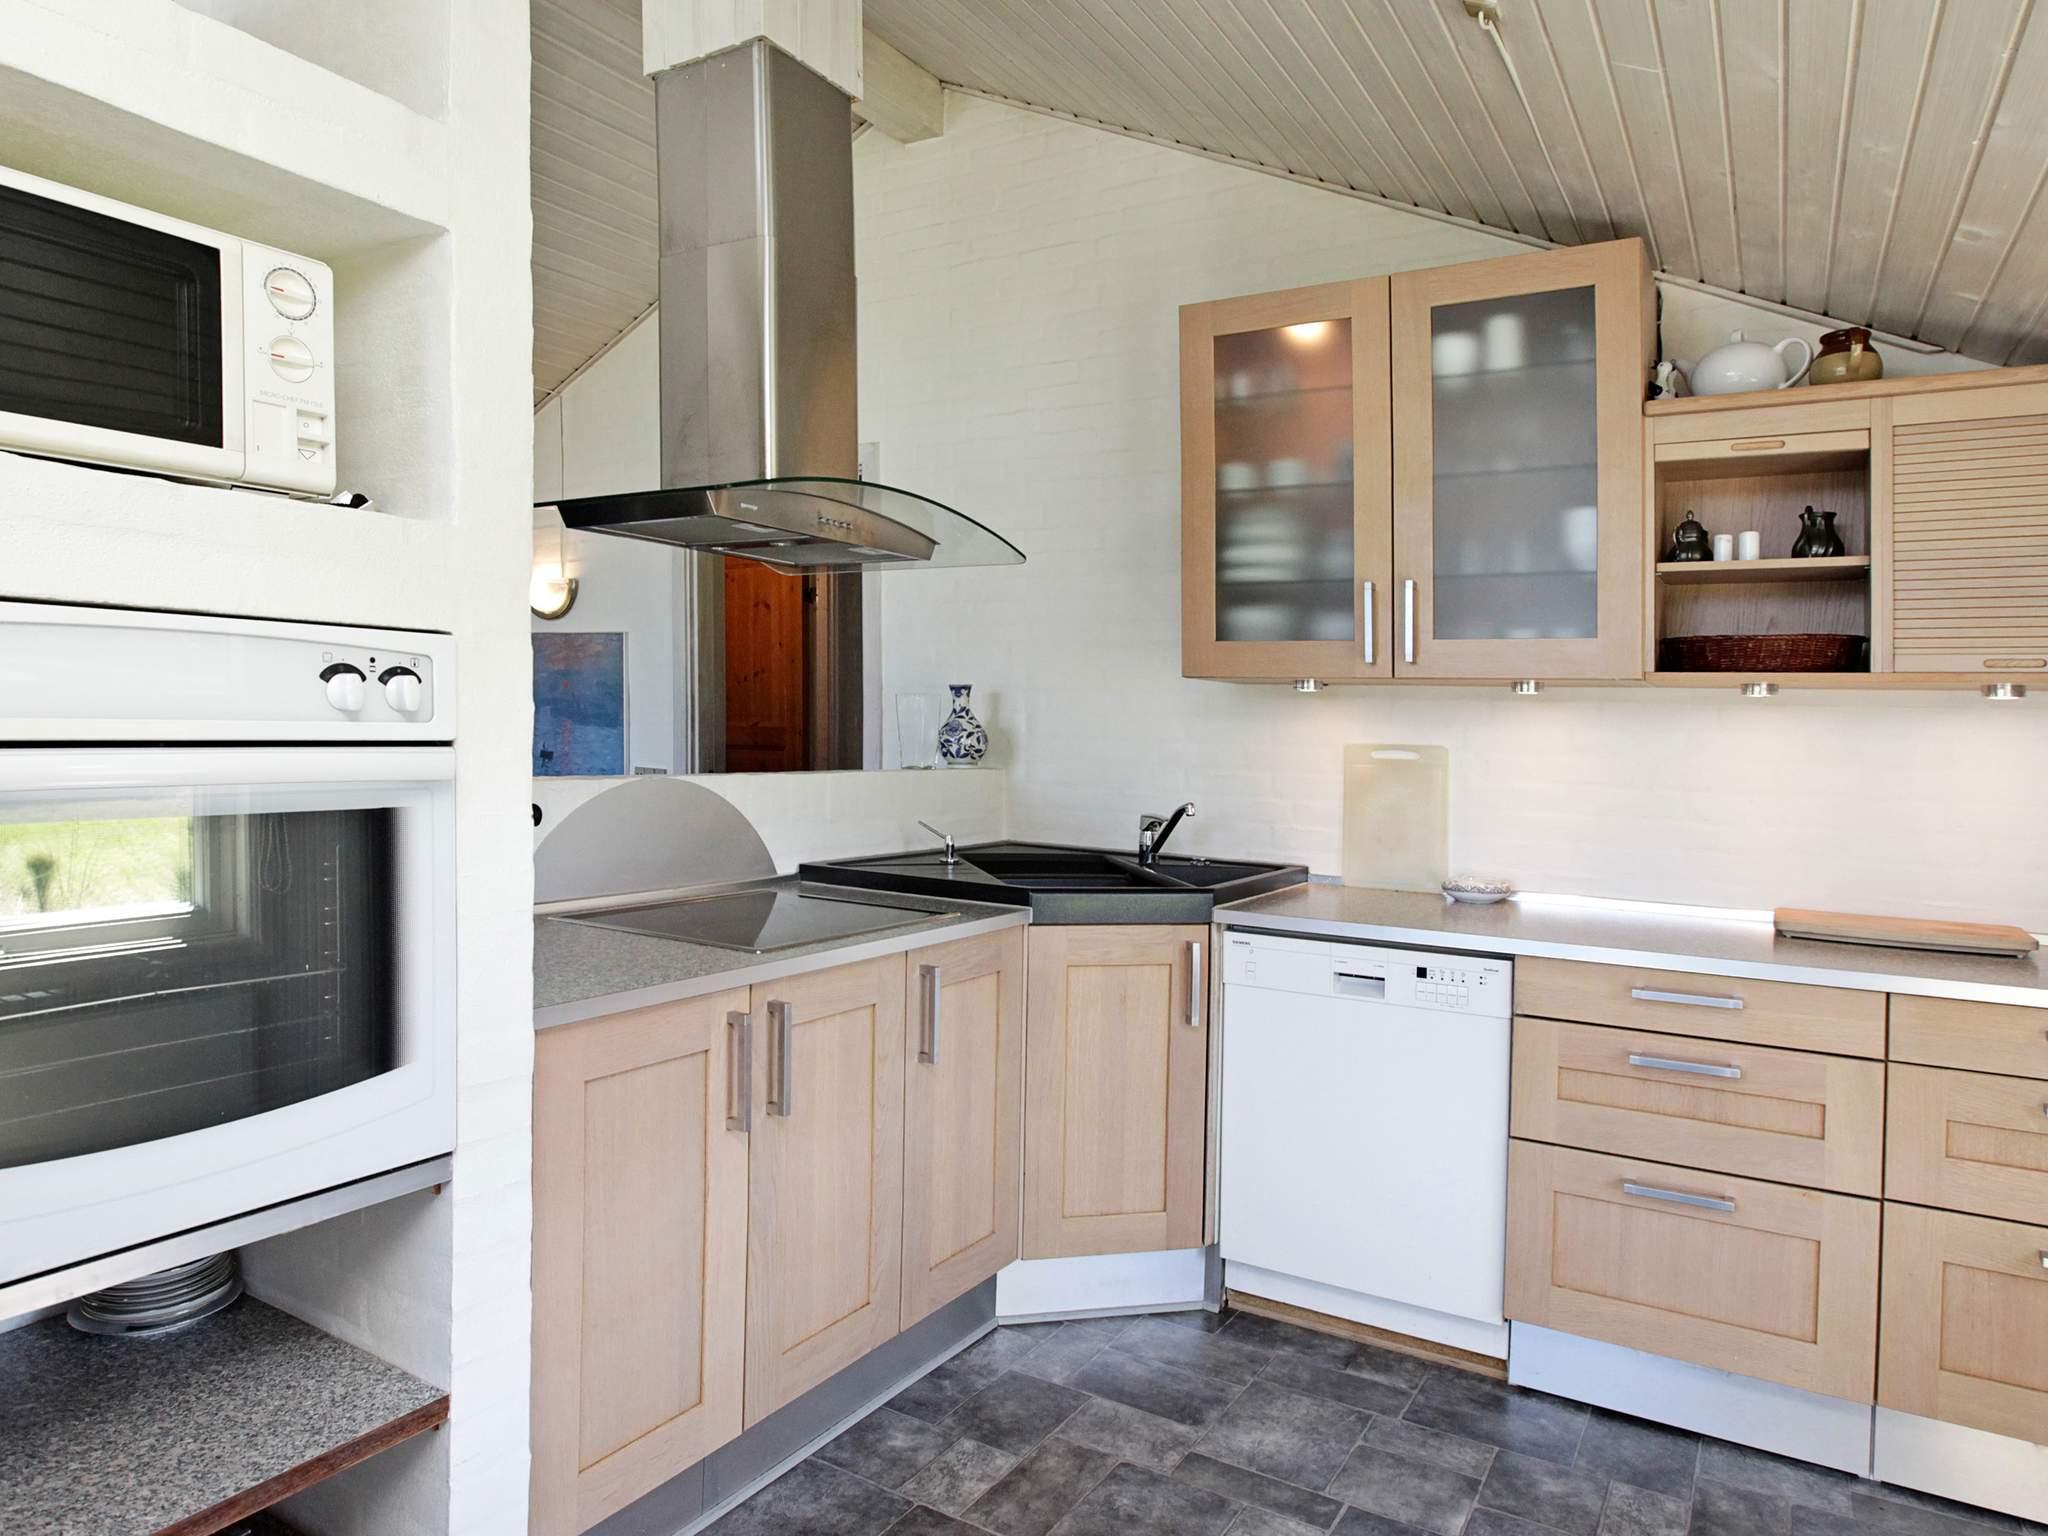 Ferienhaus Blåvand (88586), Blåvand, , Westjütland, Dänemark, Bild 7